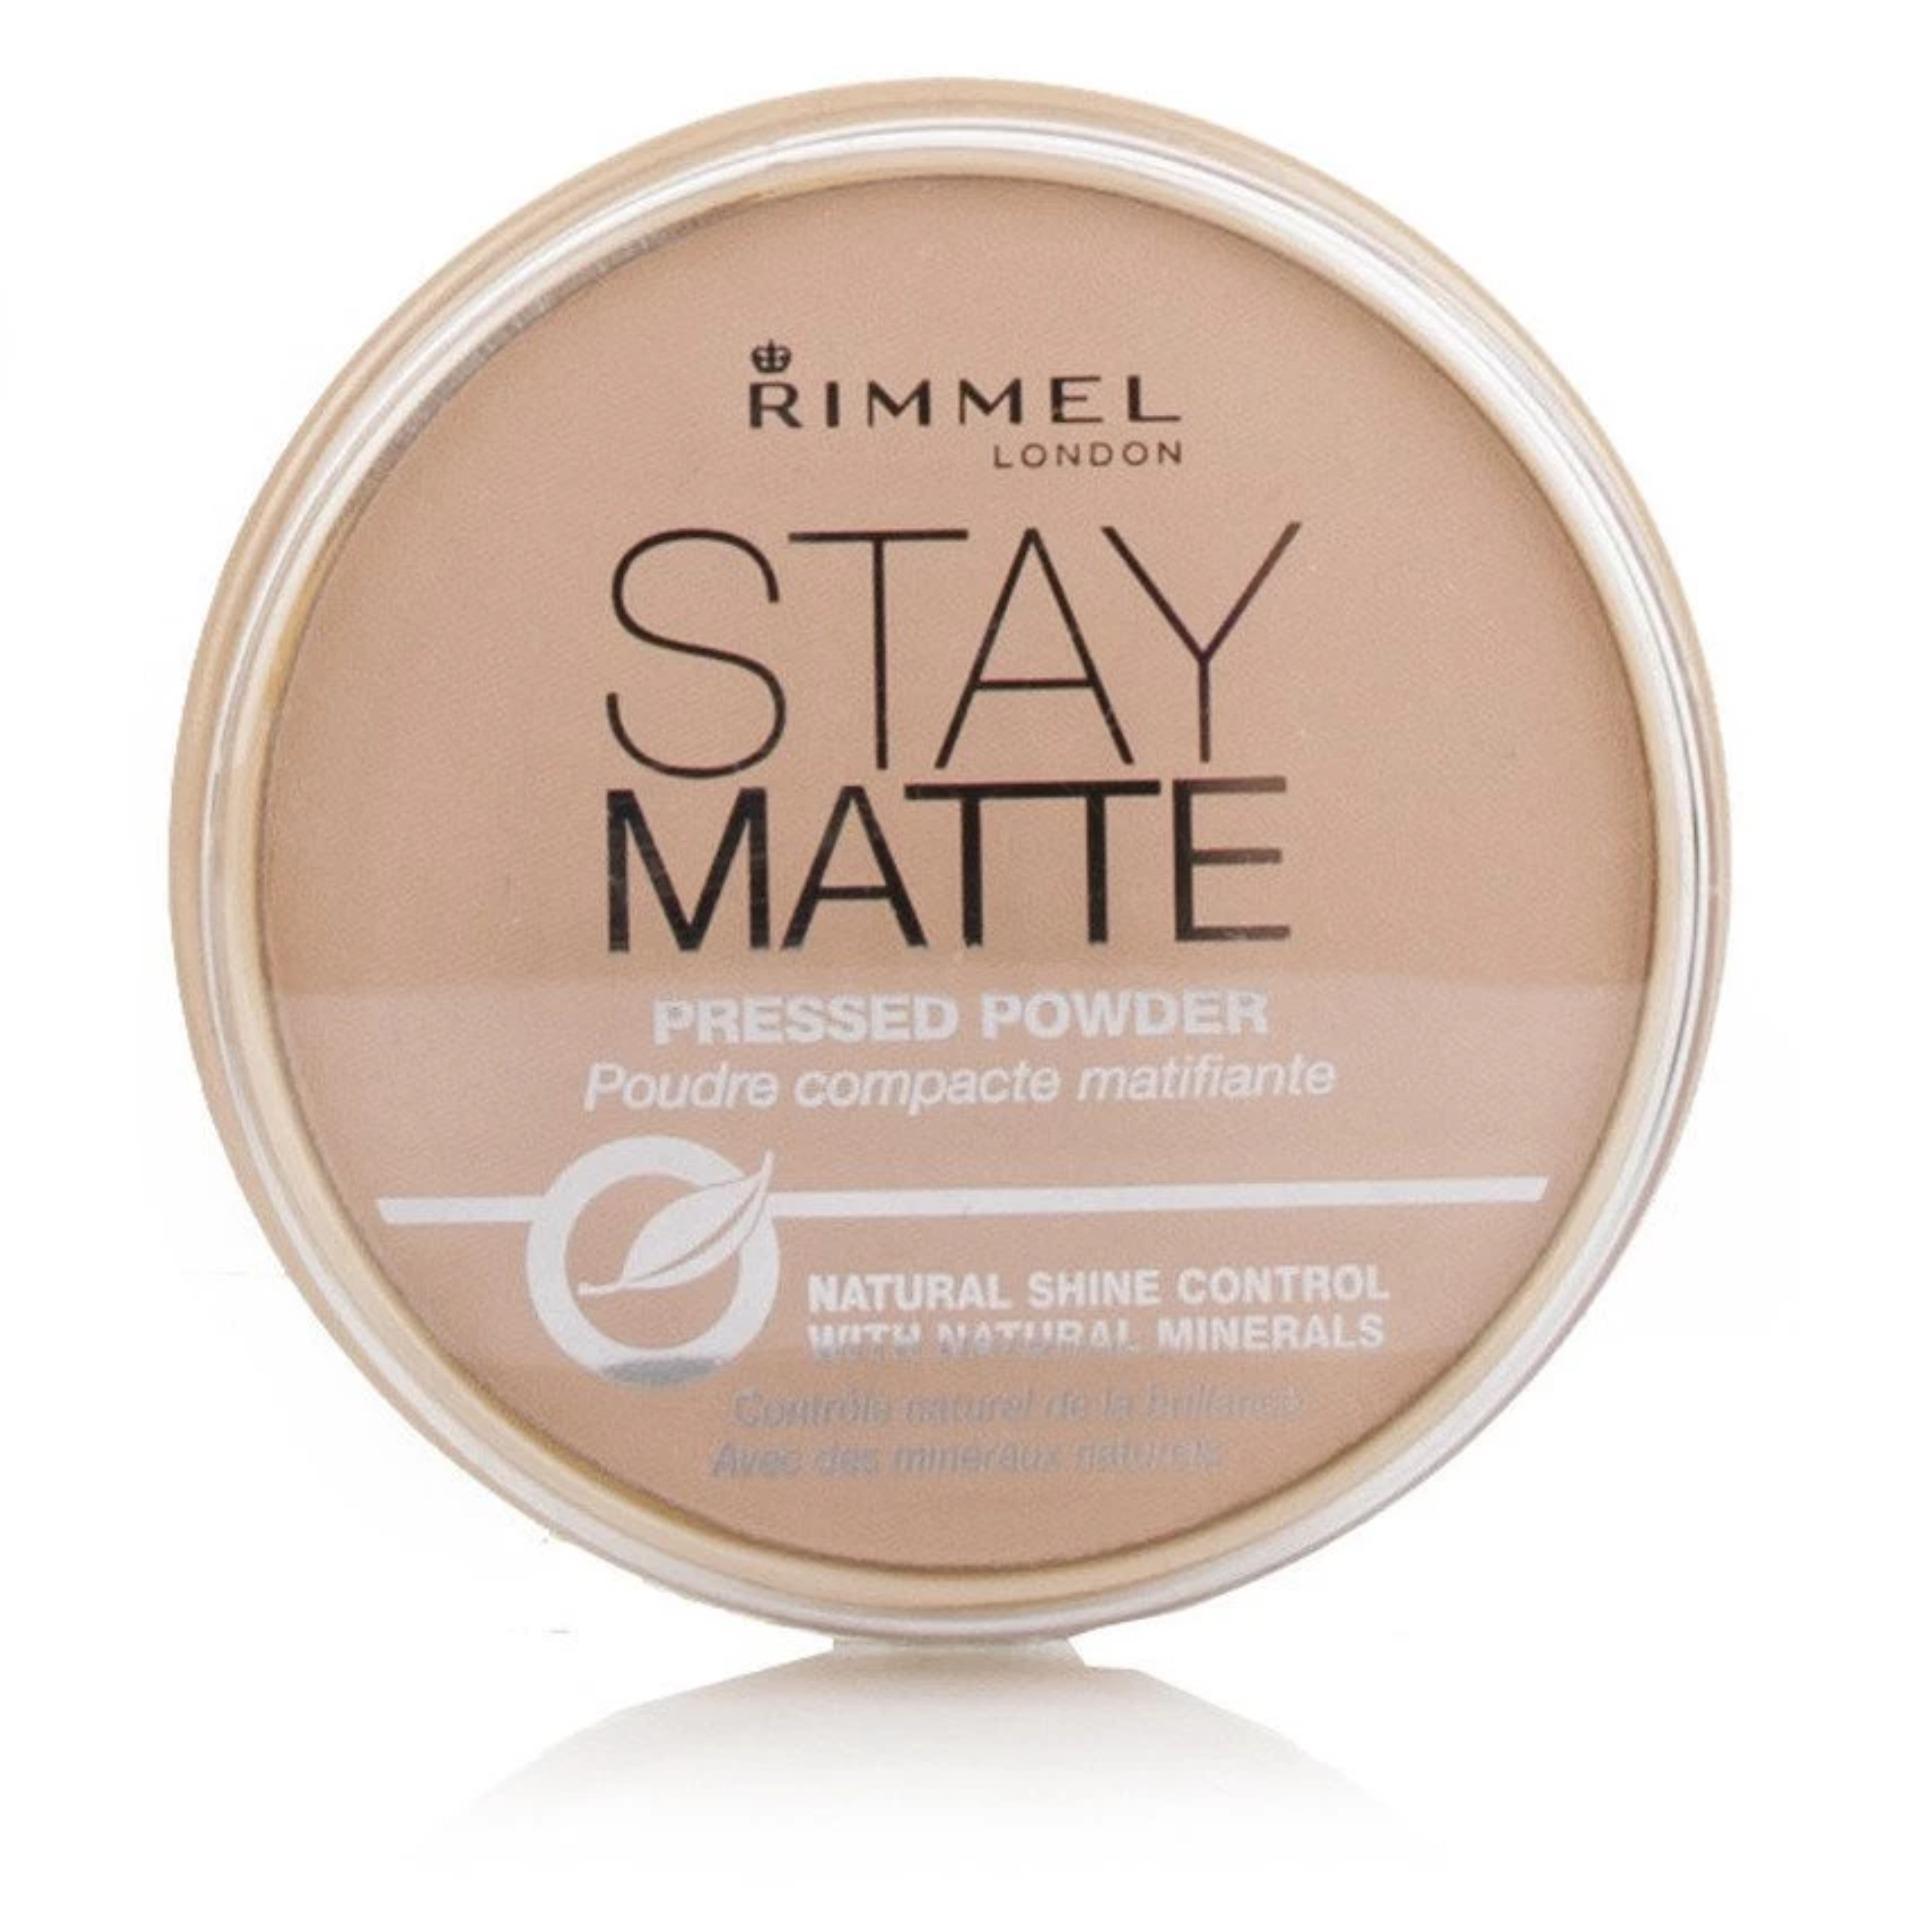 Stay Matte Pressed Powder # Silky Beige Original Tahan Lama Bedak Padat Asli Samarkan Noda Face Wajah Segar Cantik Bersinar Bebas Kilap Makeup Rias Lembut Ringan